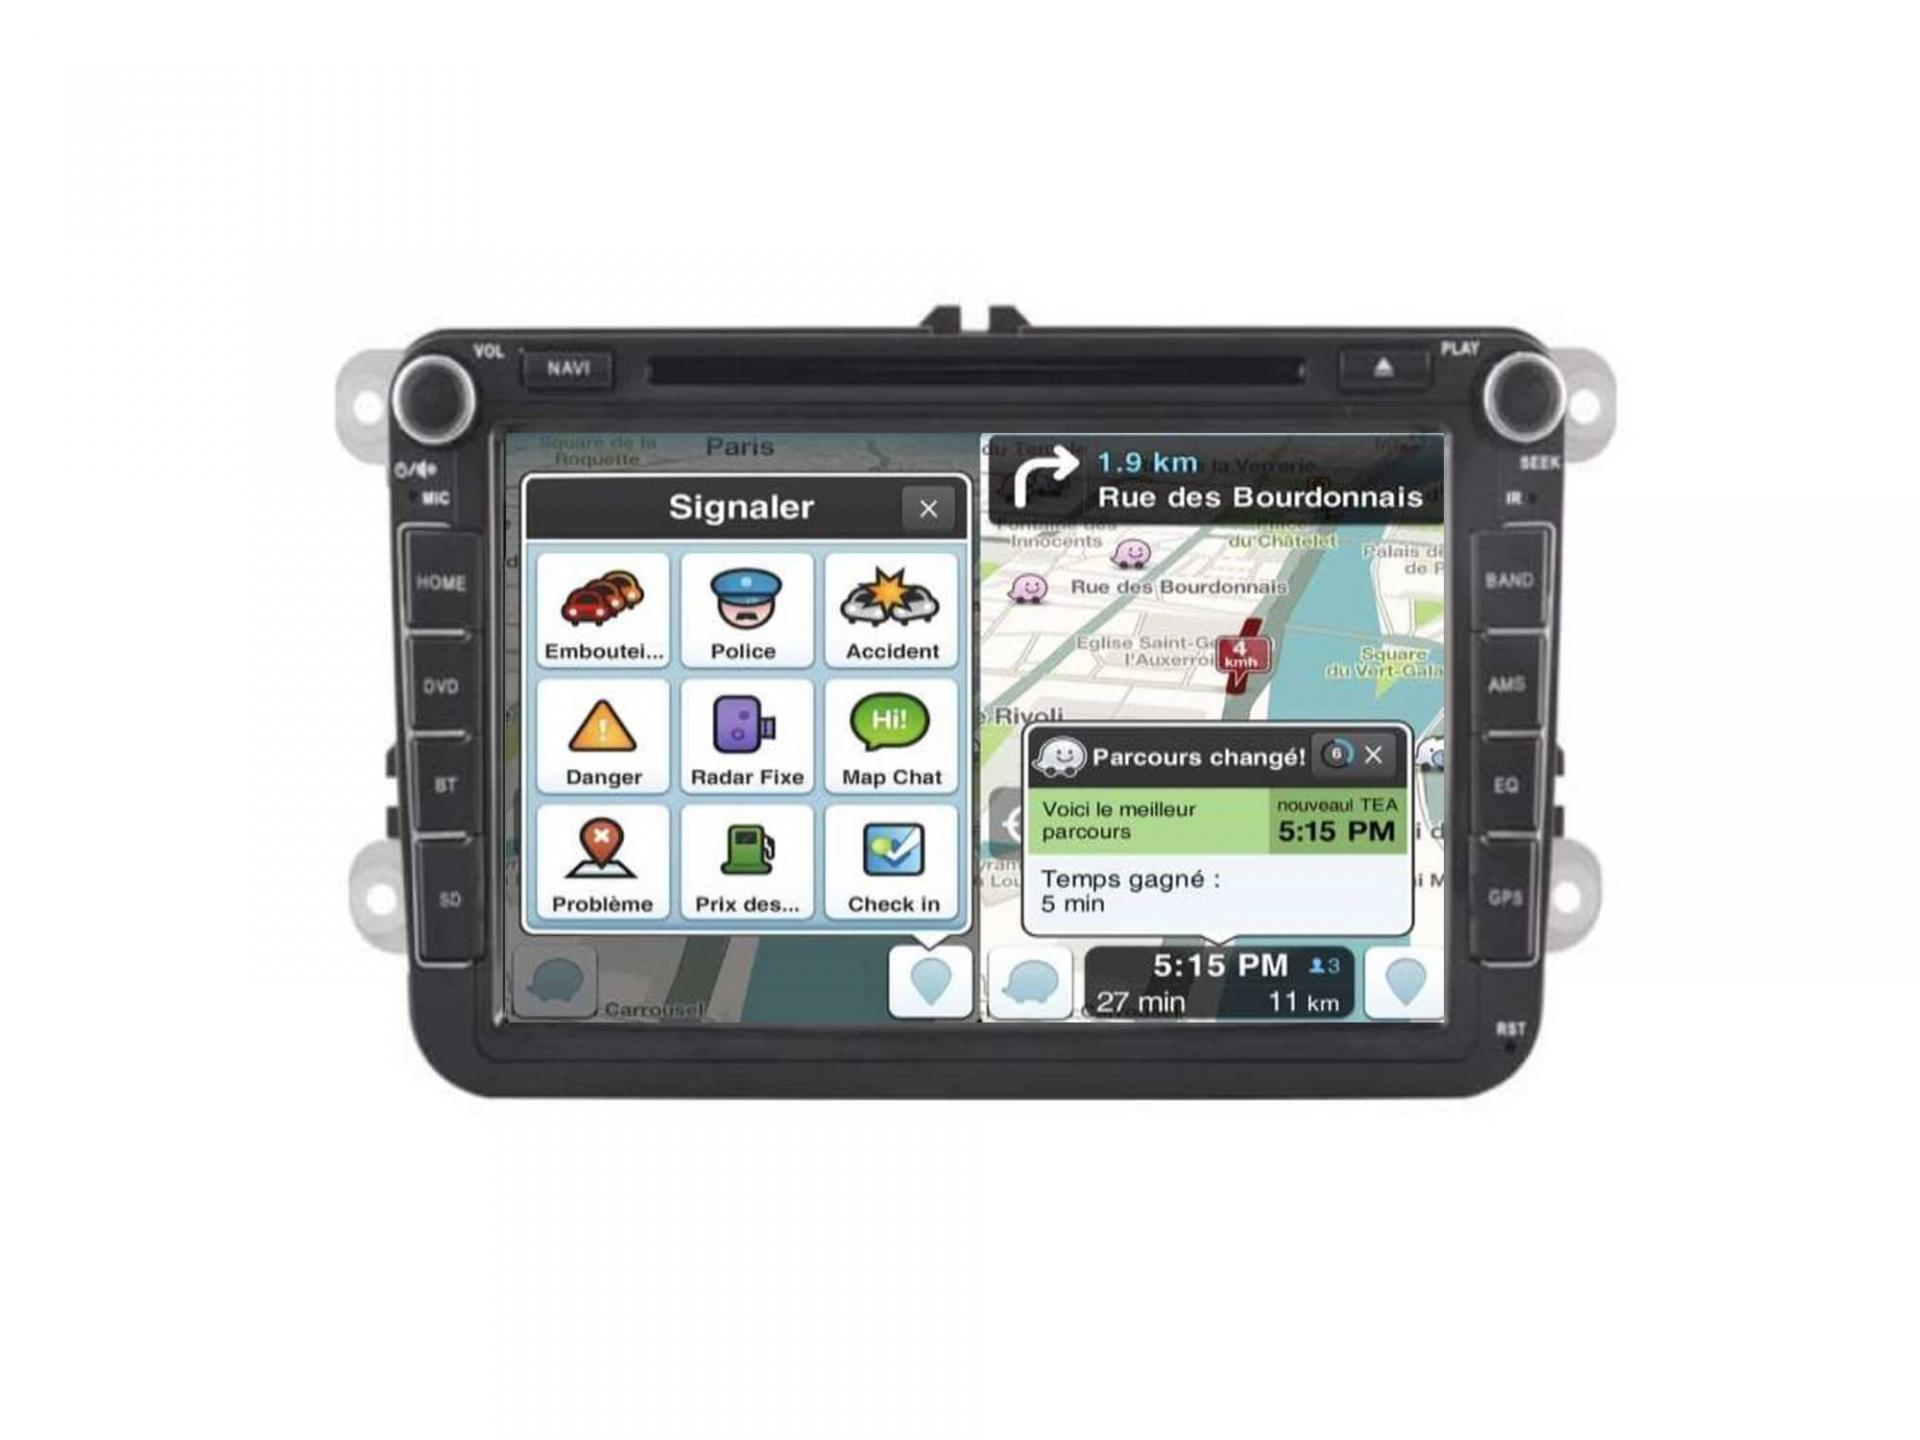 Autoradio gps carplay android auto bluetooth vw golf 5 6 touran tiguan passat transporter t5 t6 polo scirocco beetle eos 5 1